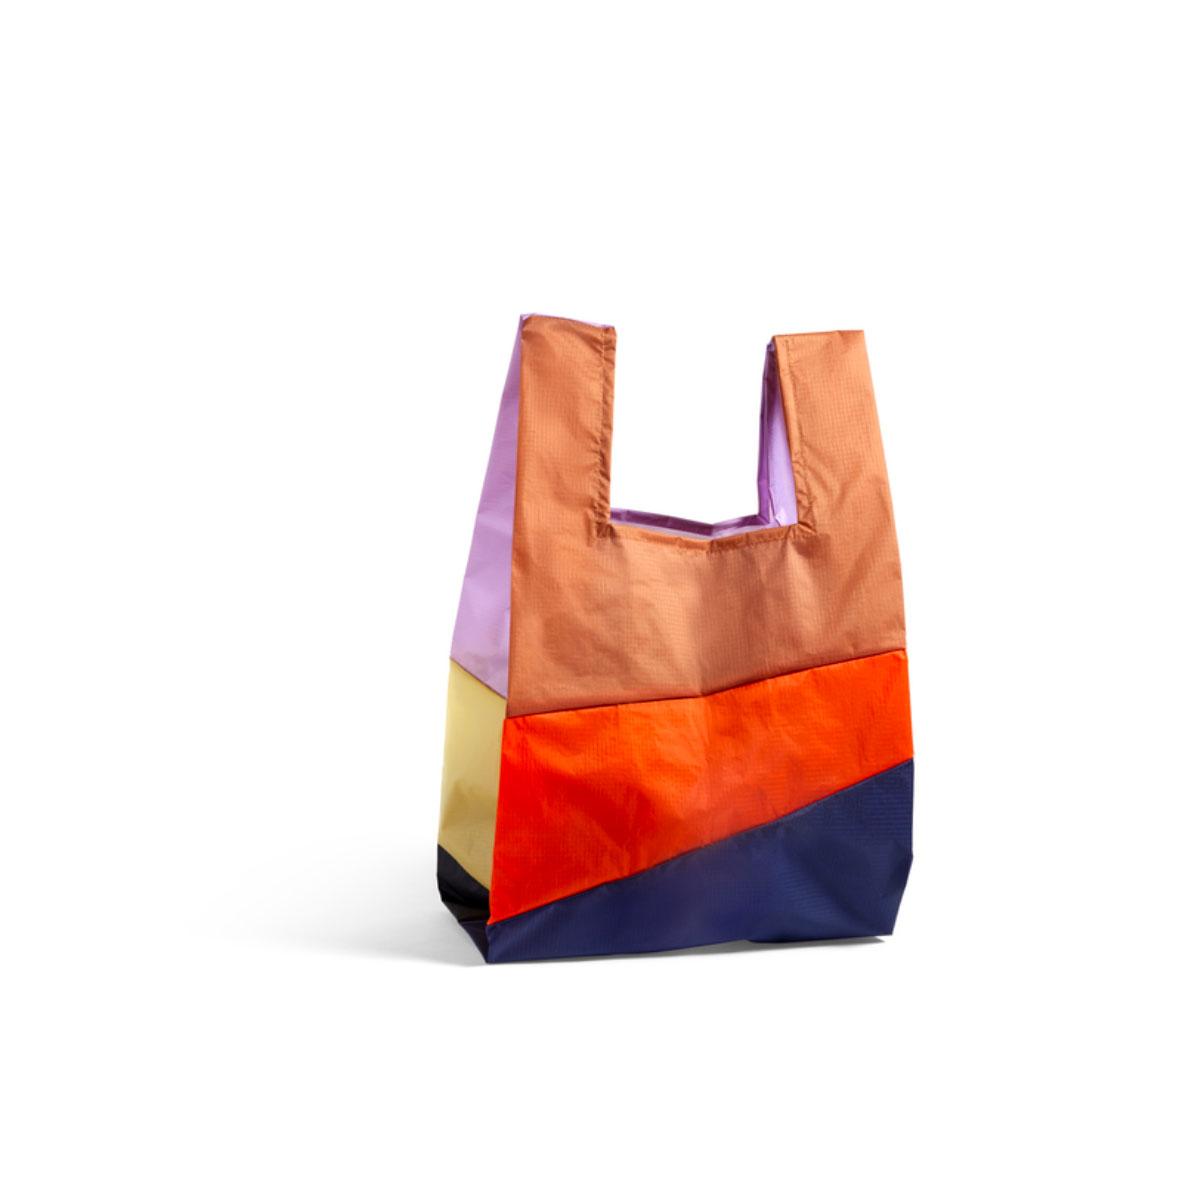 Sac SIX COLOUR multicolor orange